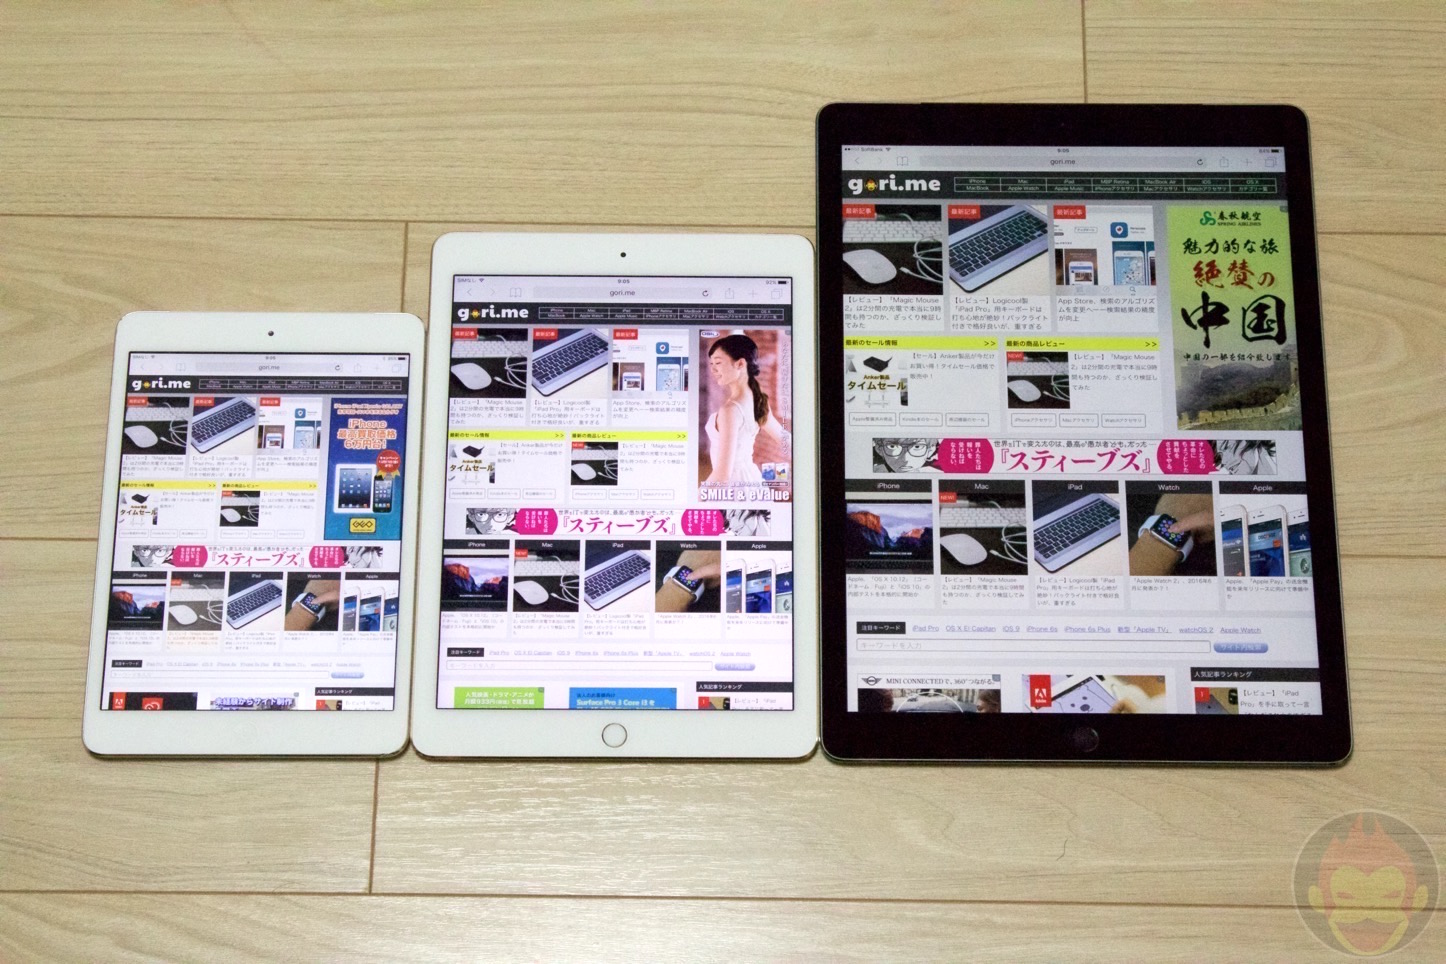 iPad-Pro-Air2-mini2-Comparison-05.jpg